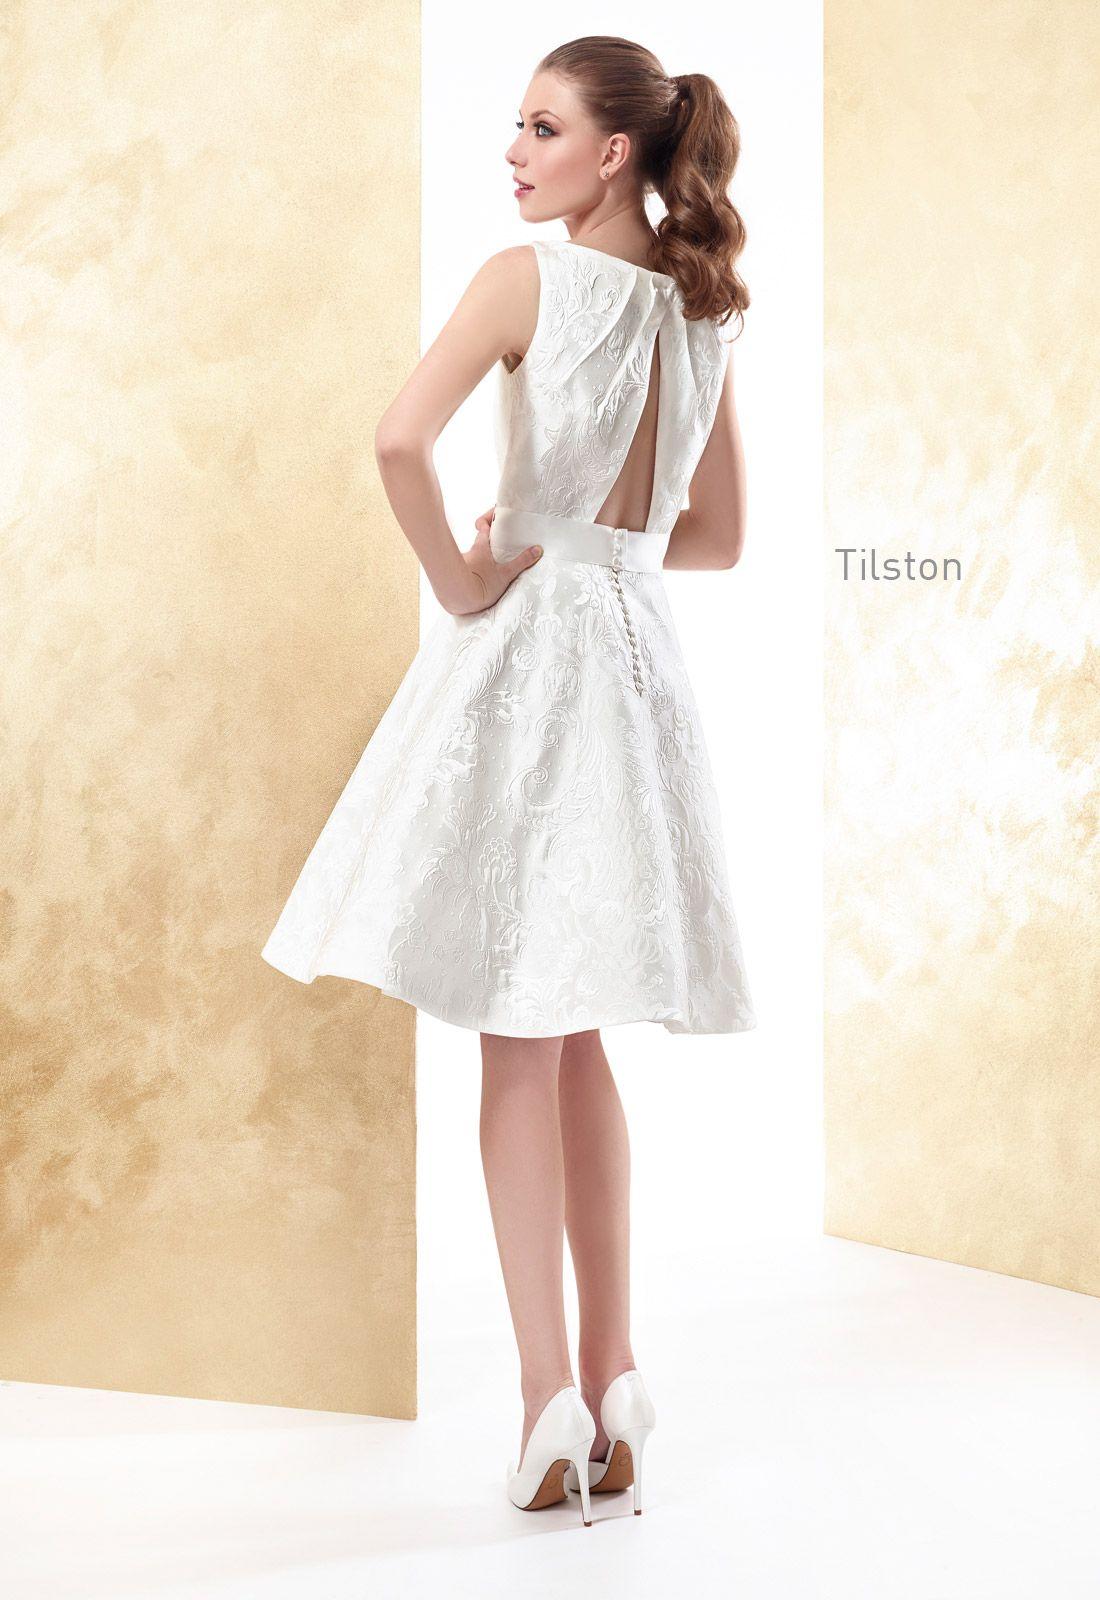 Tilston wedding dress cabotine dresses pinterest wedding dress